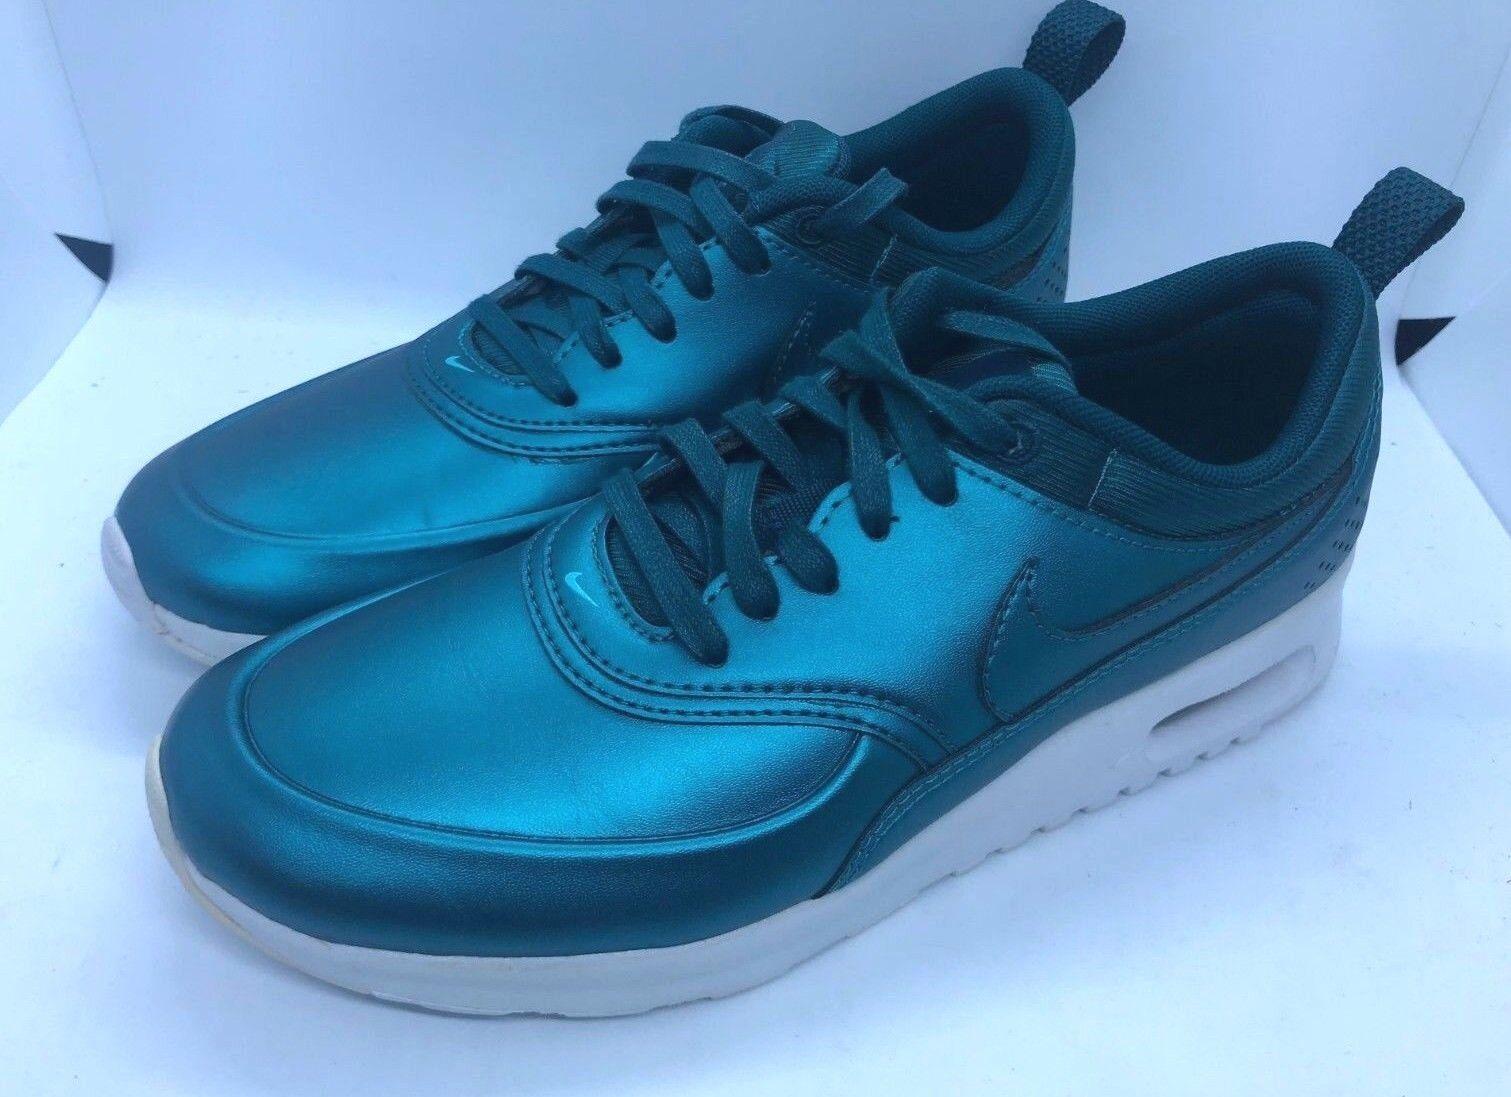 Nike air max thea donne scarpe 861674-901 metallico oscuro mare sz 7